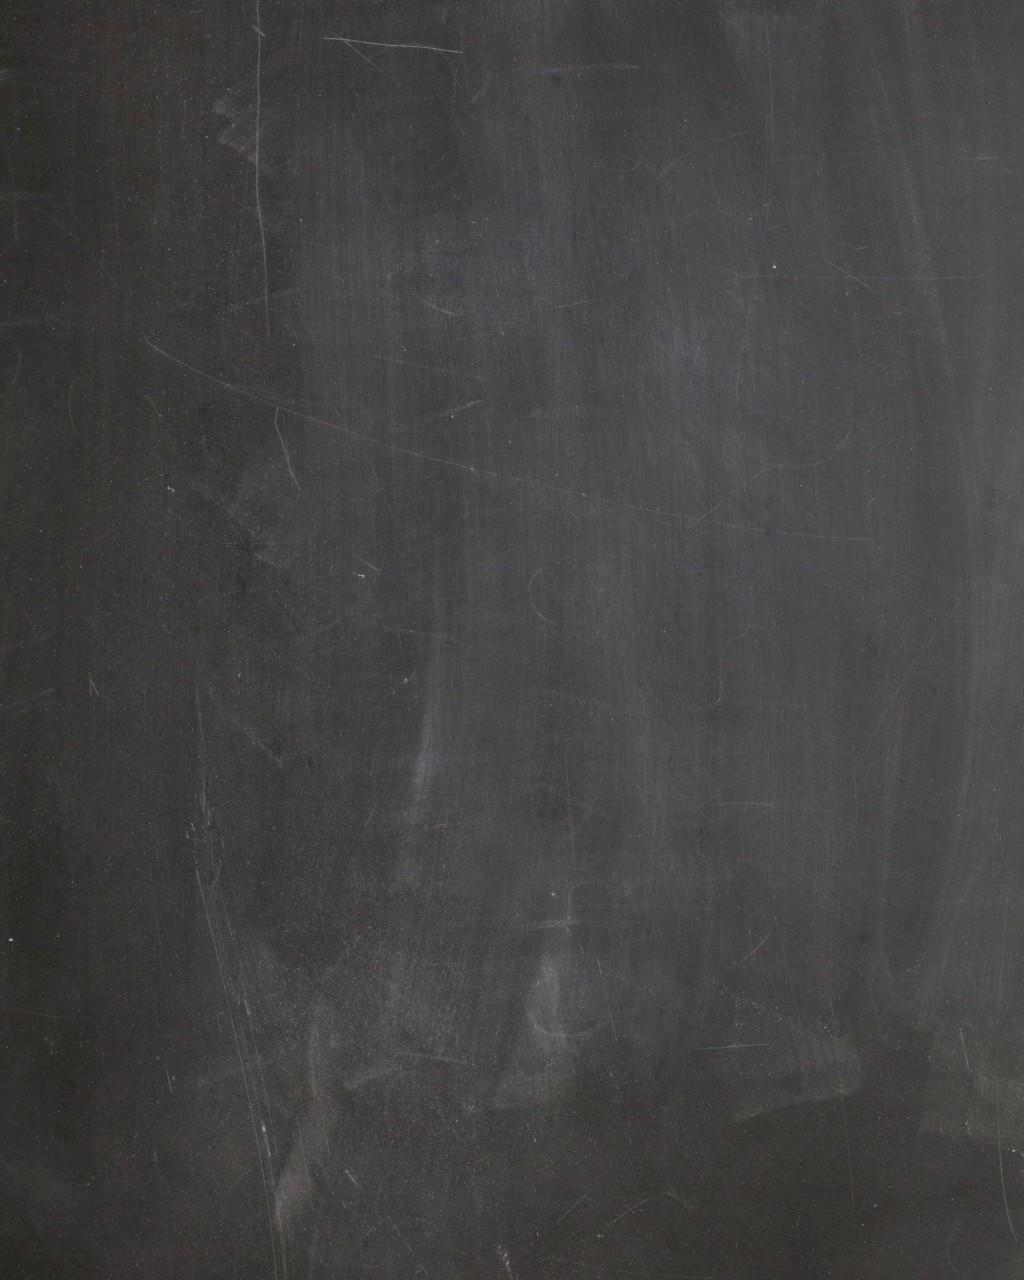 002 Awful Chalkboard Template Microsoft Word Idea  Editable MenuLarge